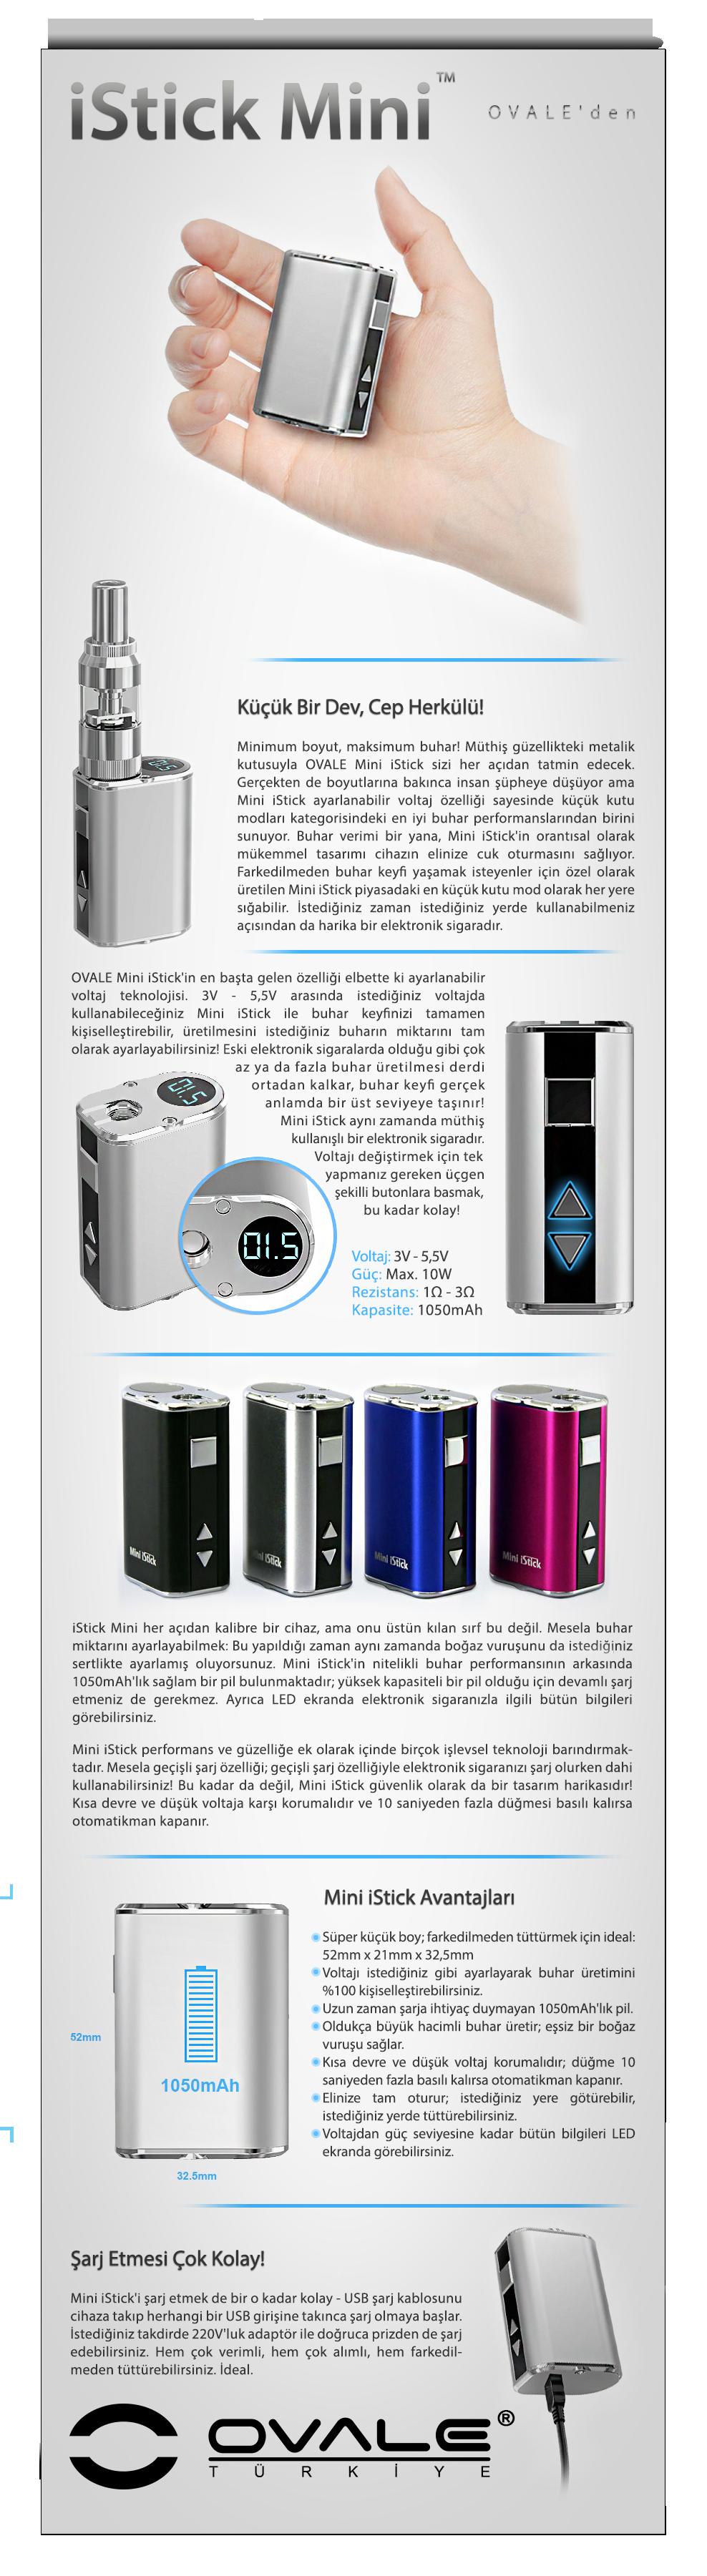 elektronik sigara, esigara, e, sigara, istick, ovale, eleaf, 10w